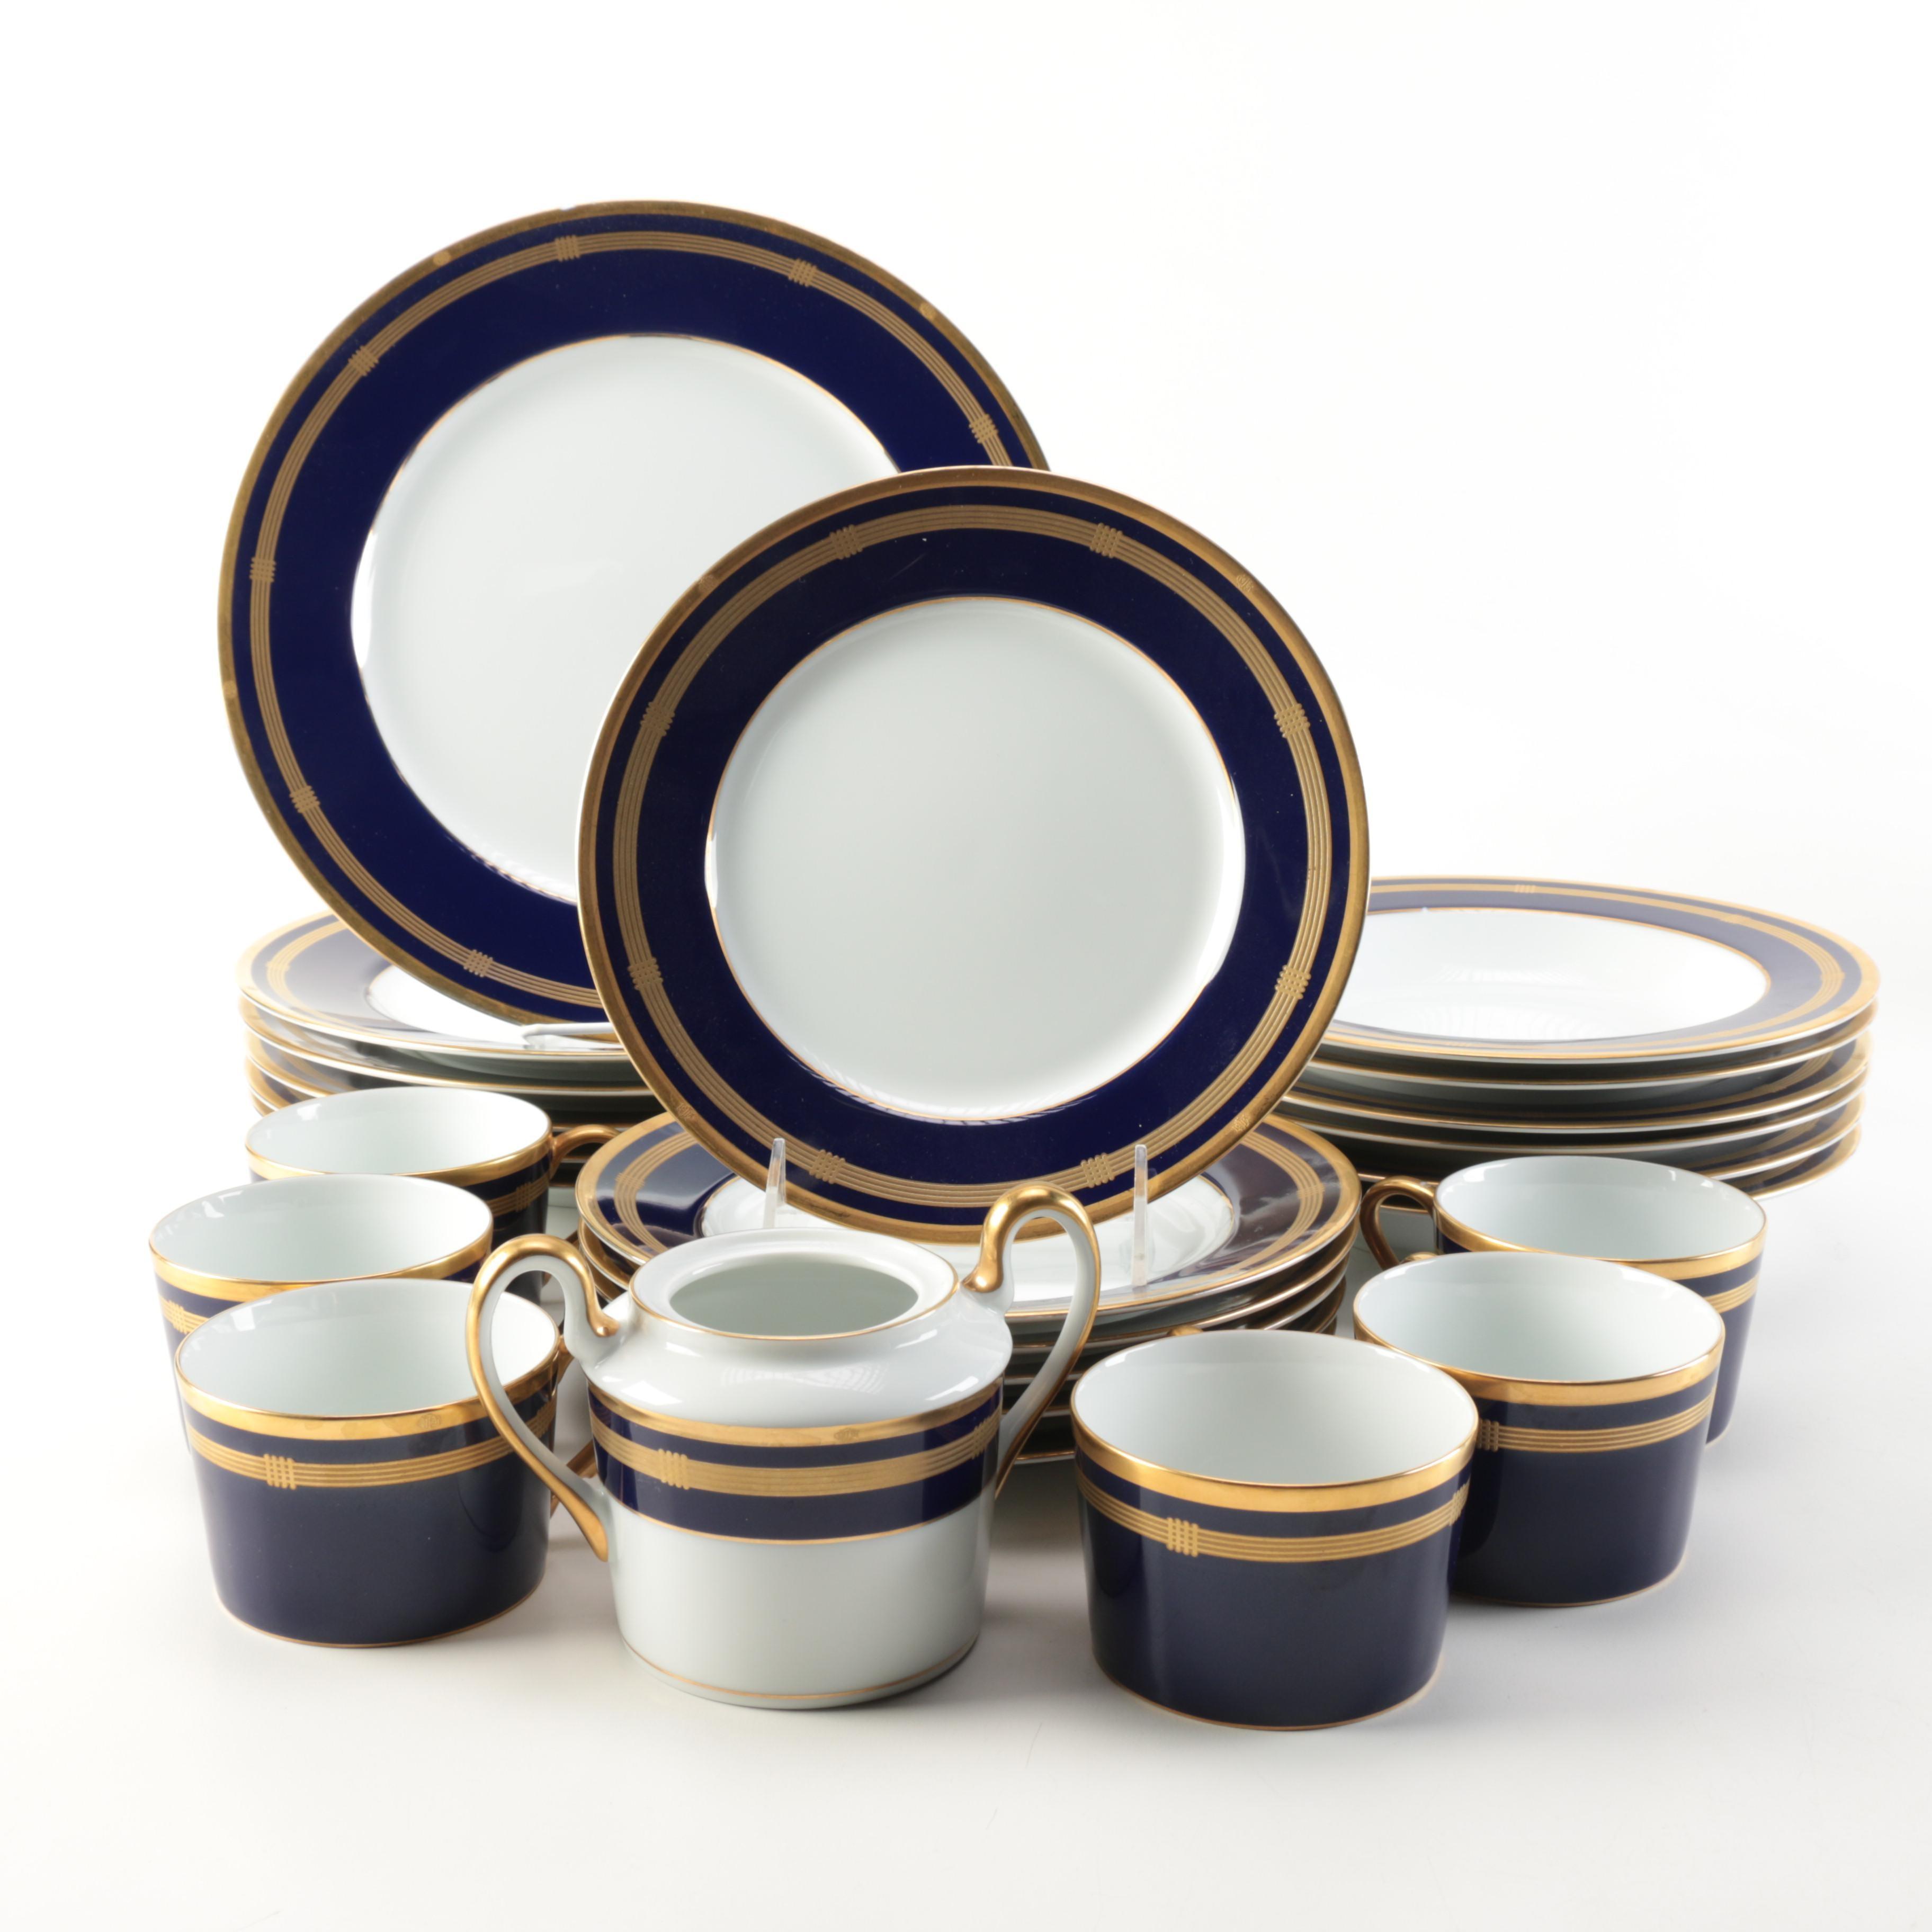 Christian Dior Porcelain Dinnerware Set  Gaudron Lapis  ...  sc 1 st  EBTH.com & Christian Dior Porcelain Dinnerware Set